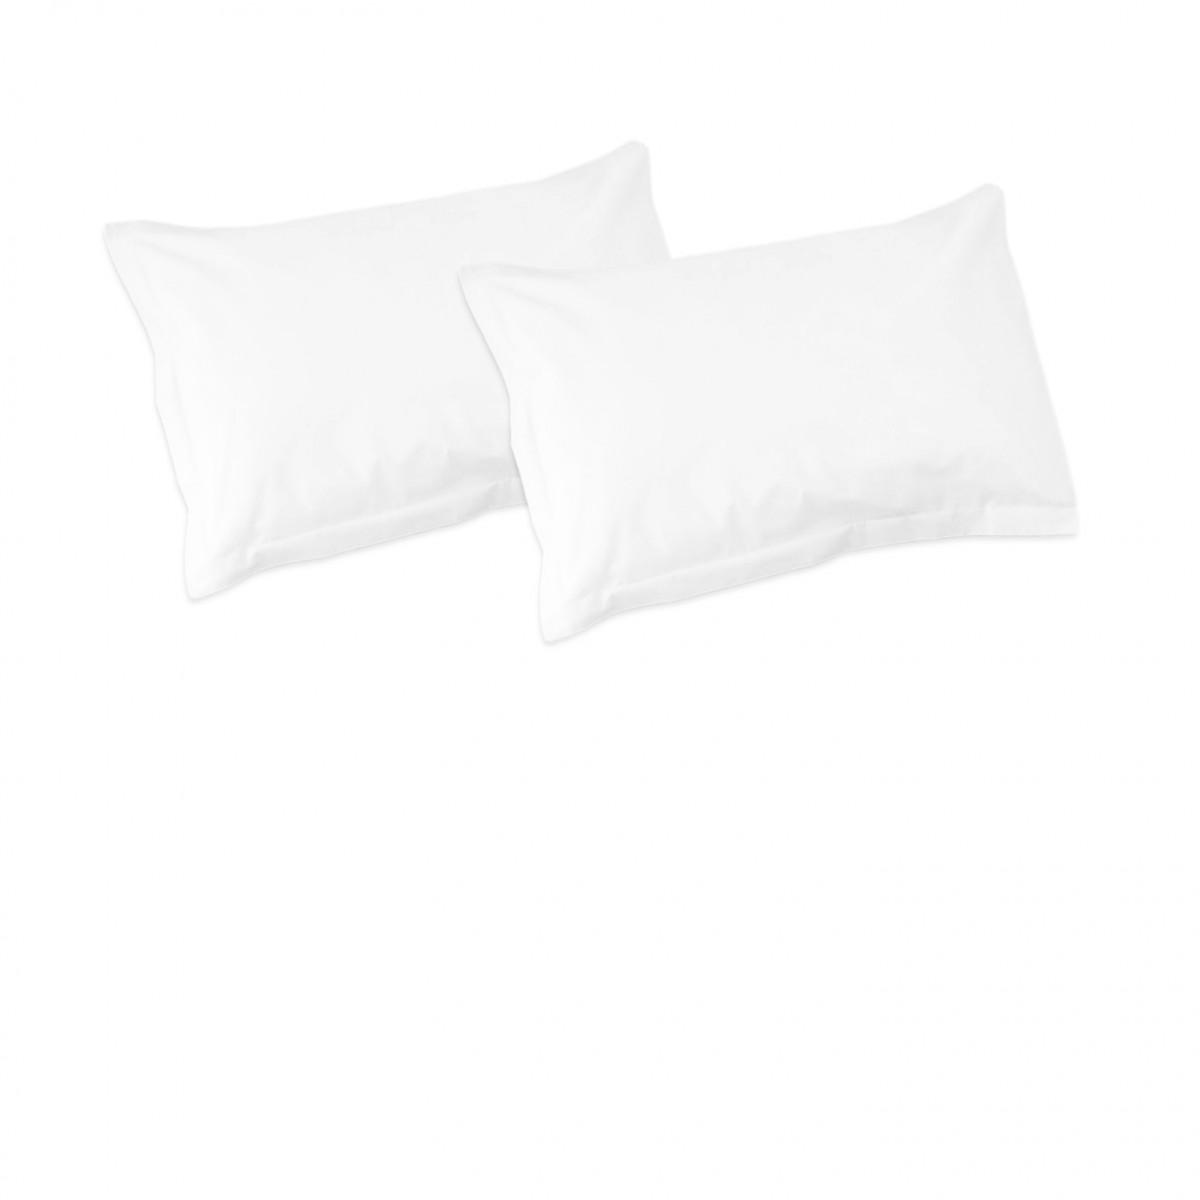 White  Pillow cases  100 Cotton Bedding  SoulBedroom EURL